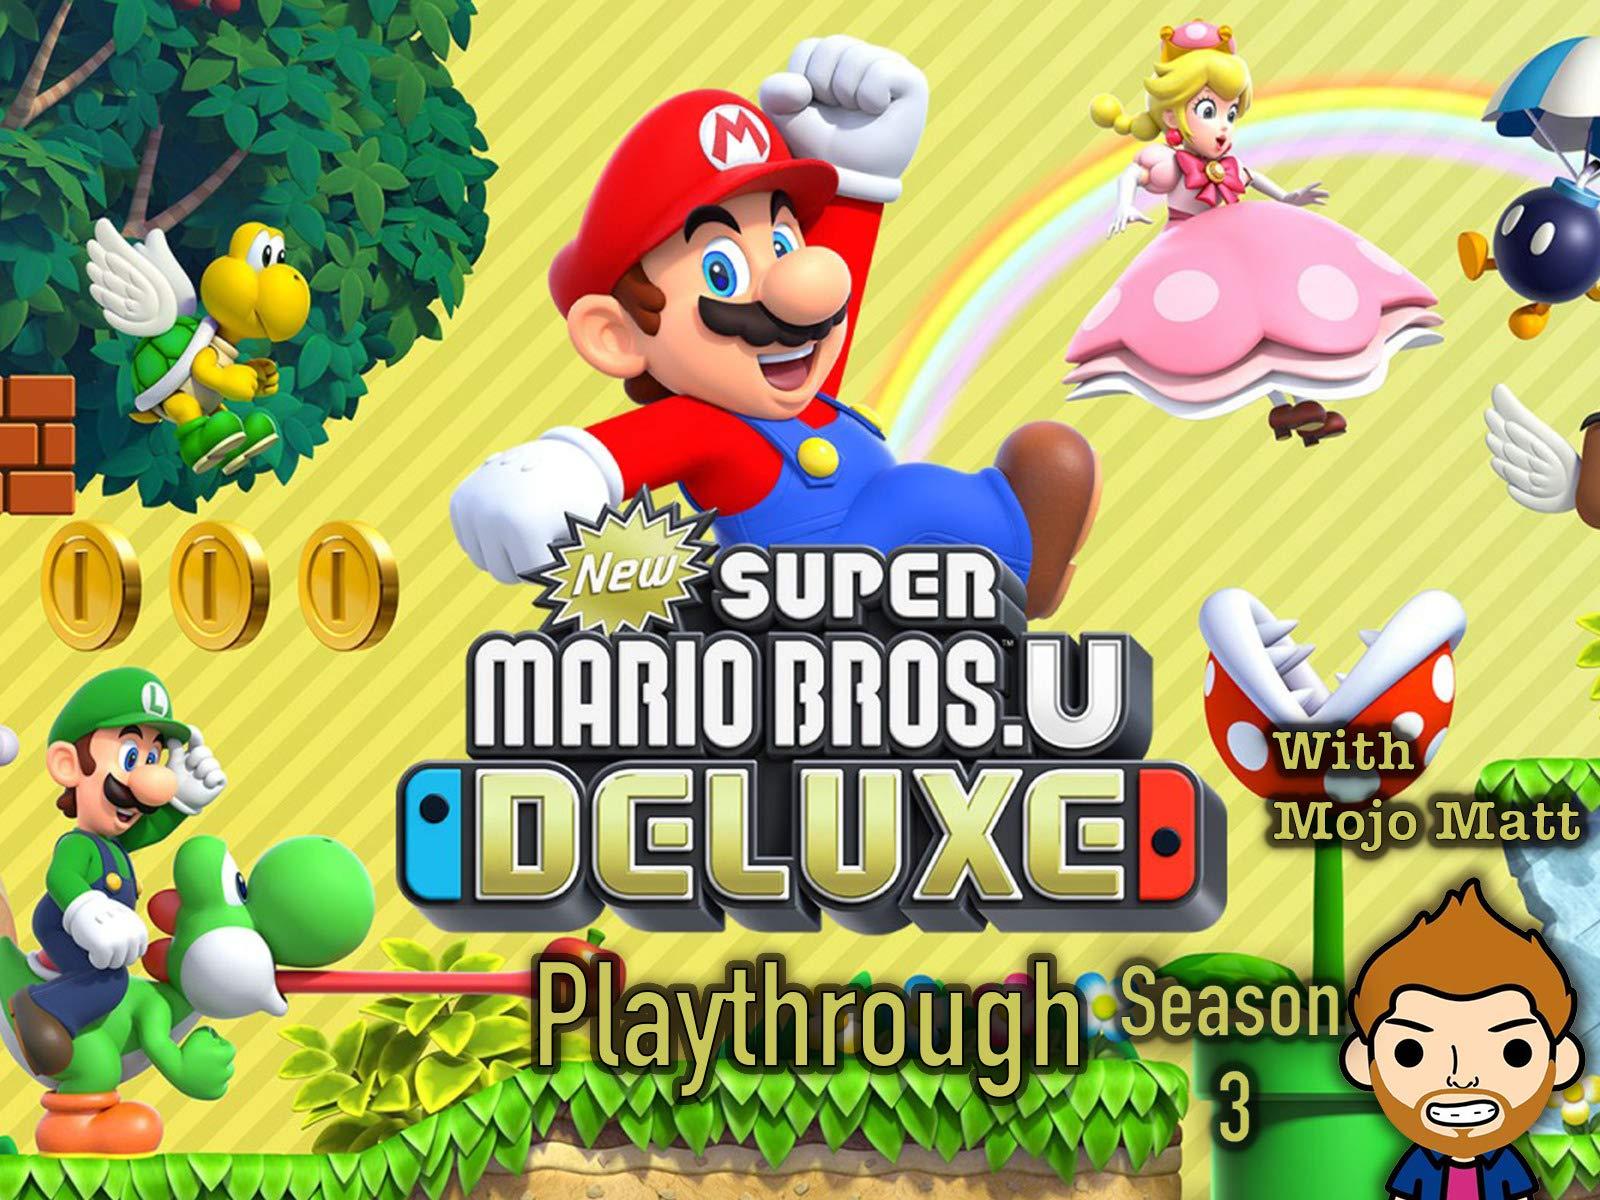 New Super Mario Bros. U Deluxe Playthrough With Mojo Matt - Season 3